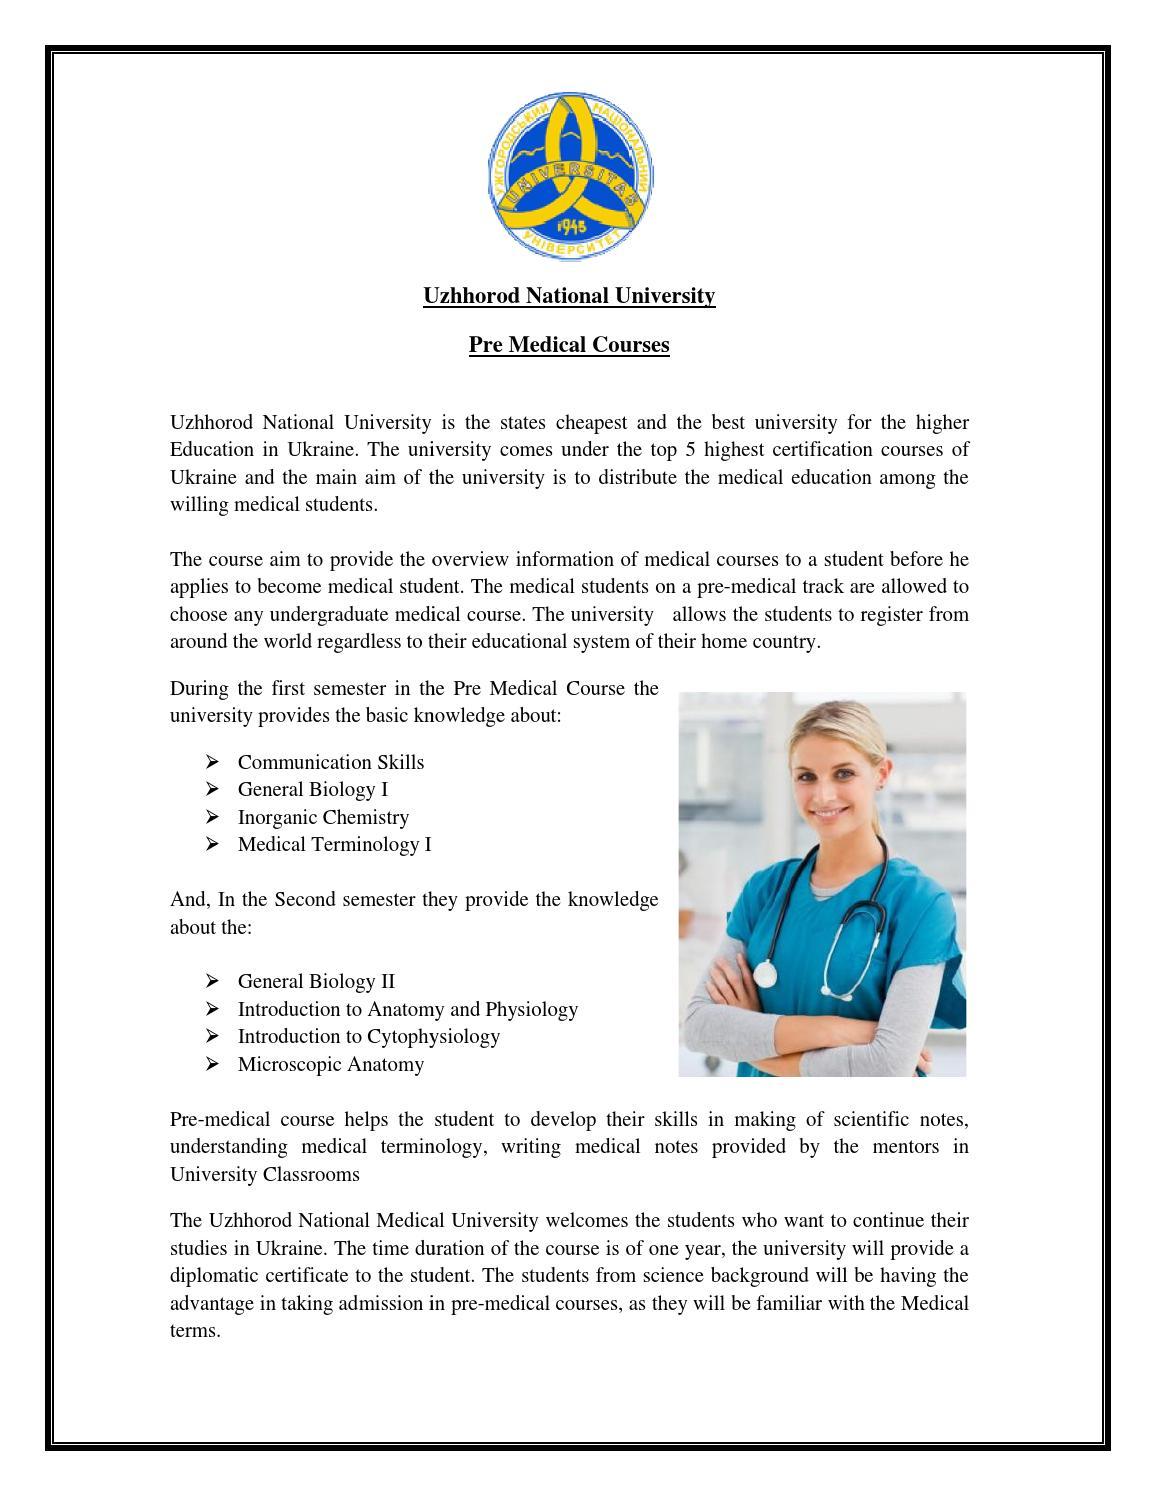 Uzhhorod national university pre medical courses pdf by